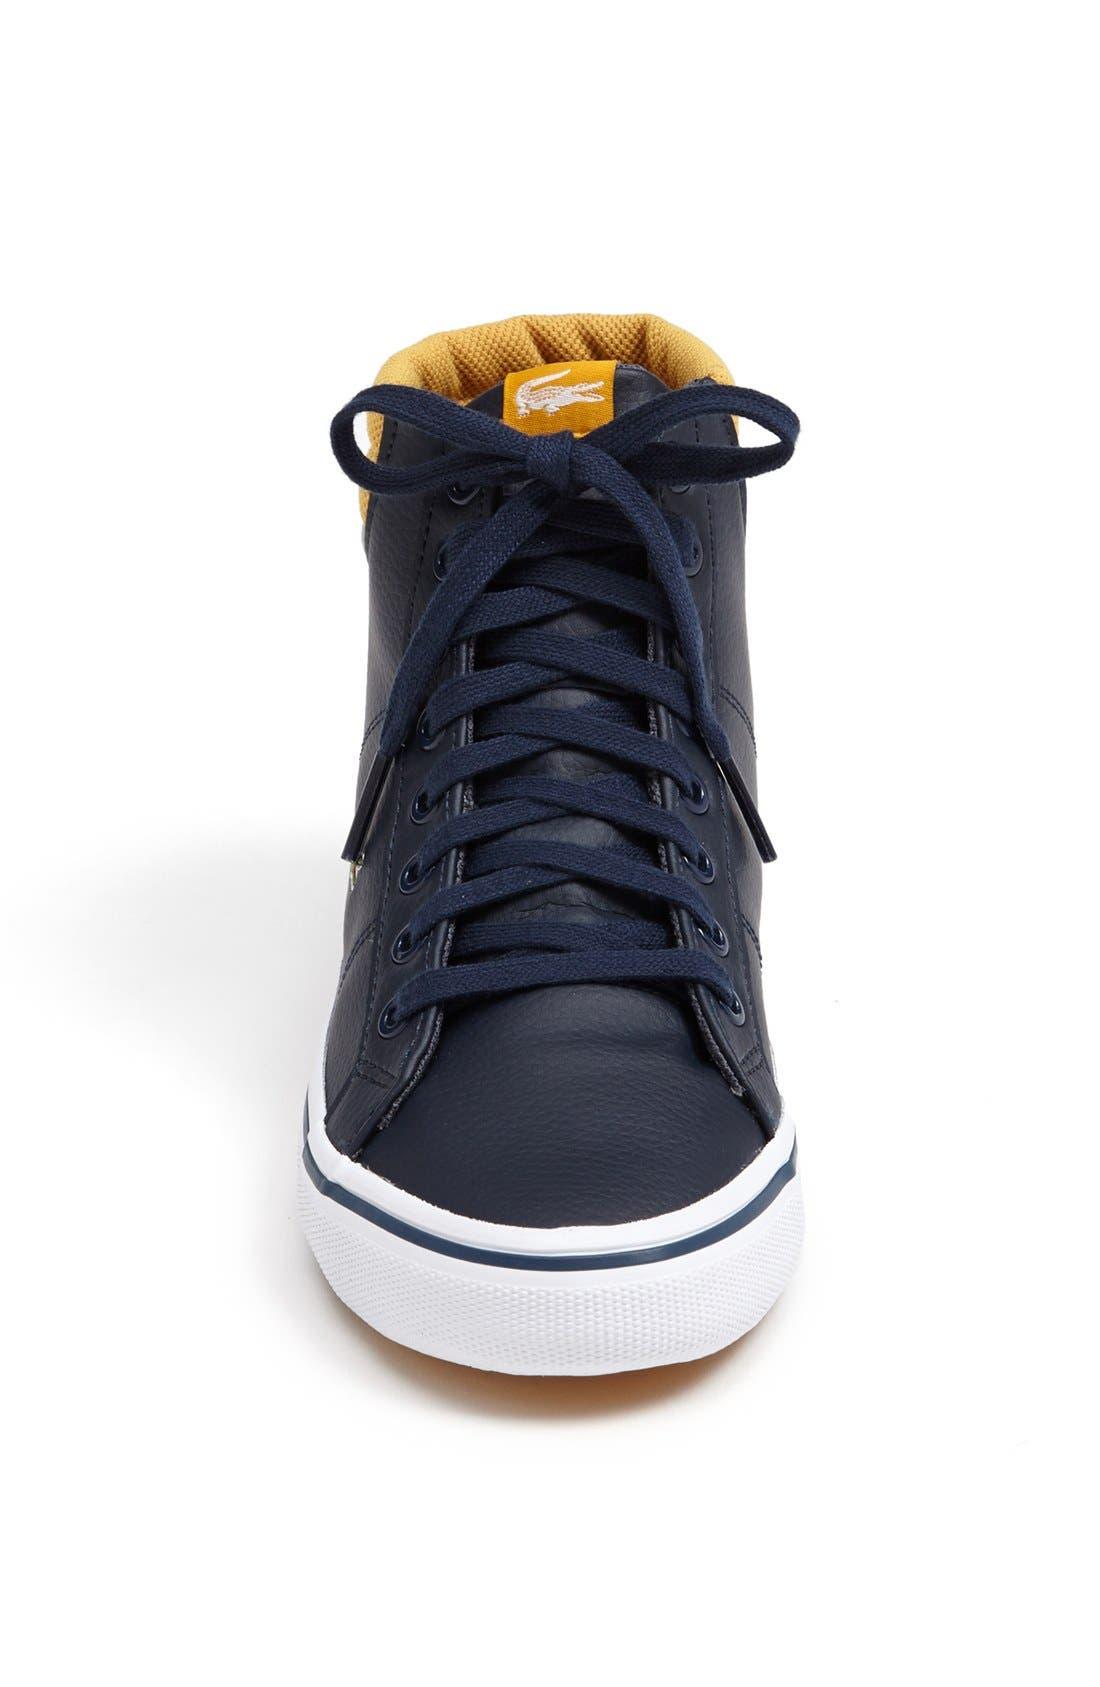 Alternate Image 3  - Lacoste 'Marcel' Sneaker (Baby, Walker, Toddler, Little Kid & Big Kid)